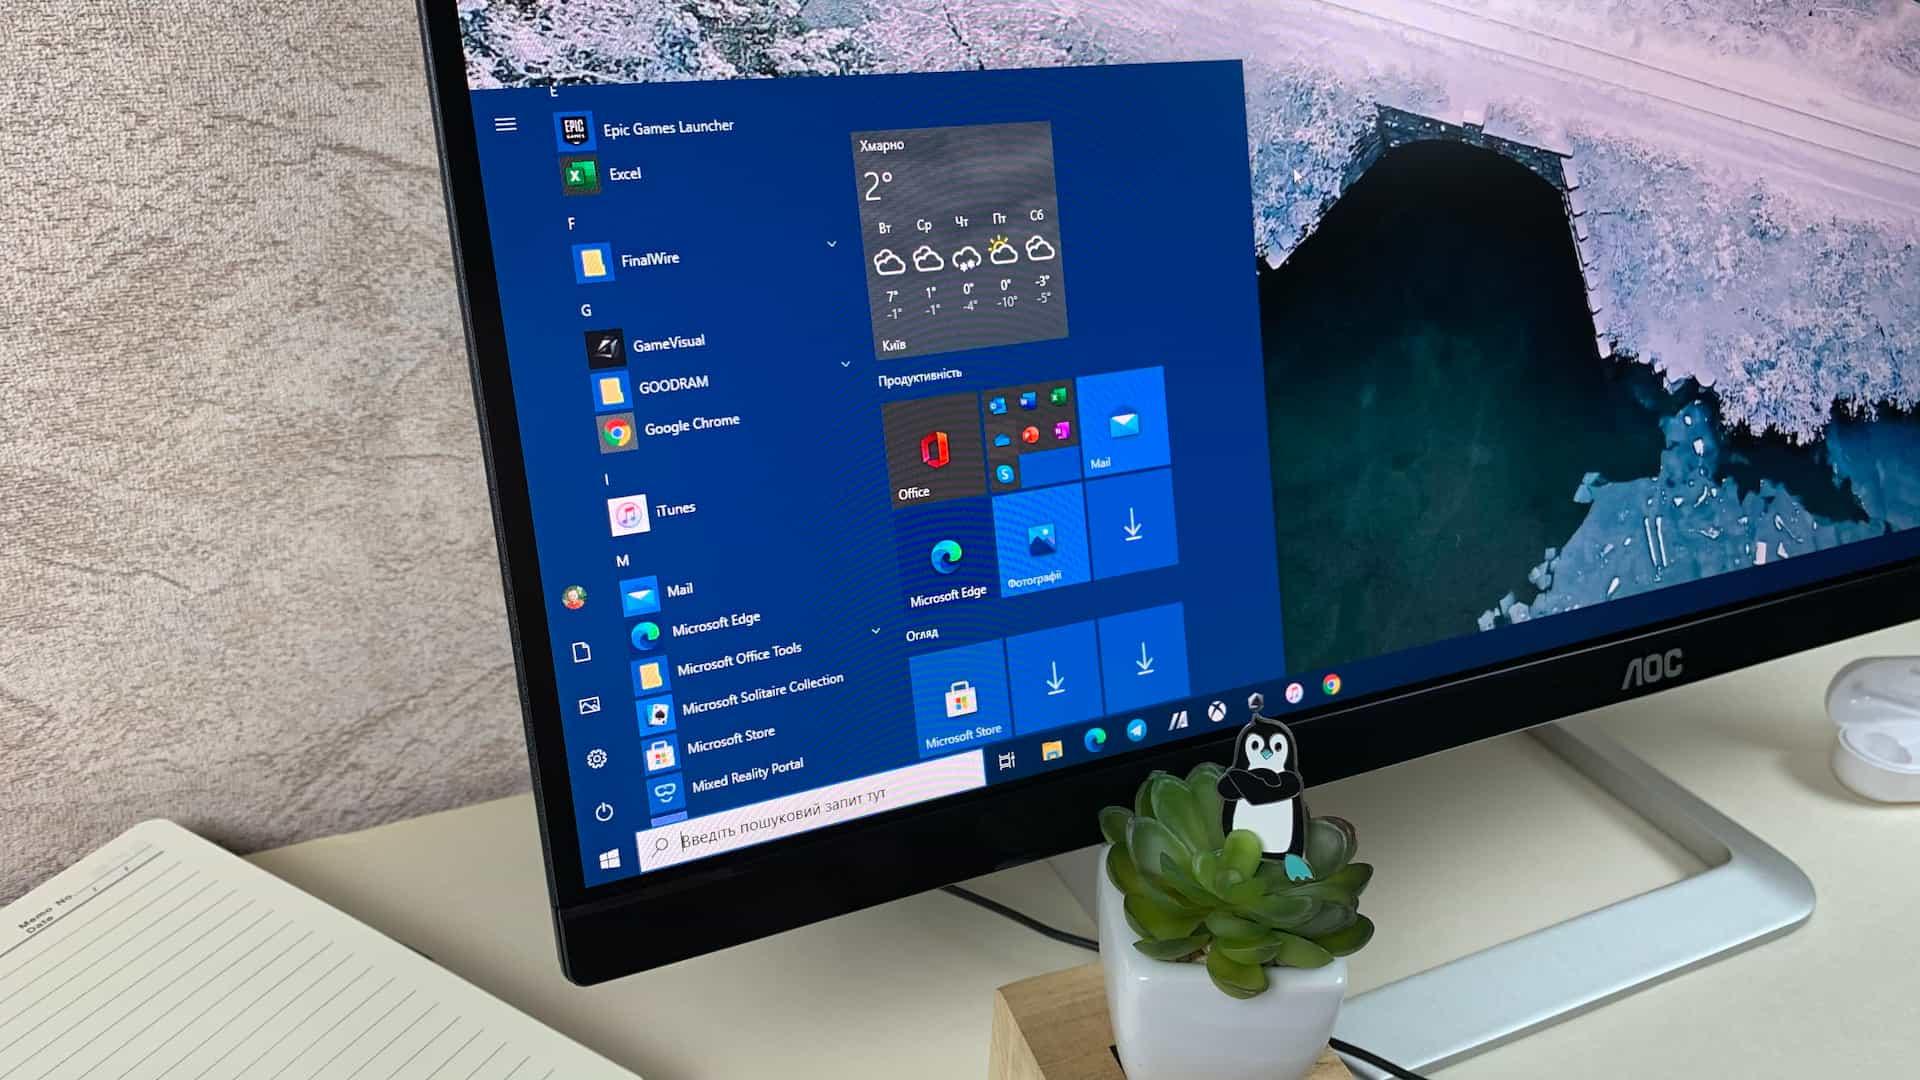 AOC Q27T1 (Windows 10)